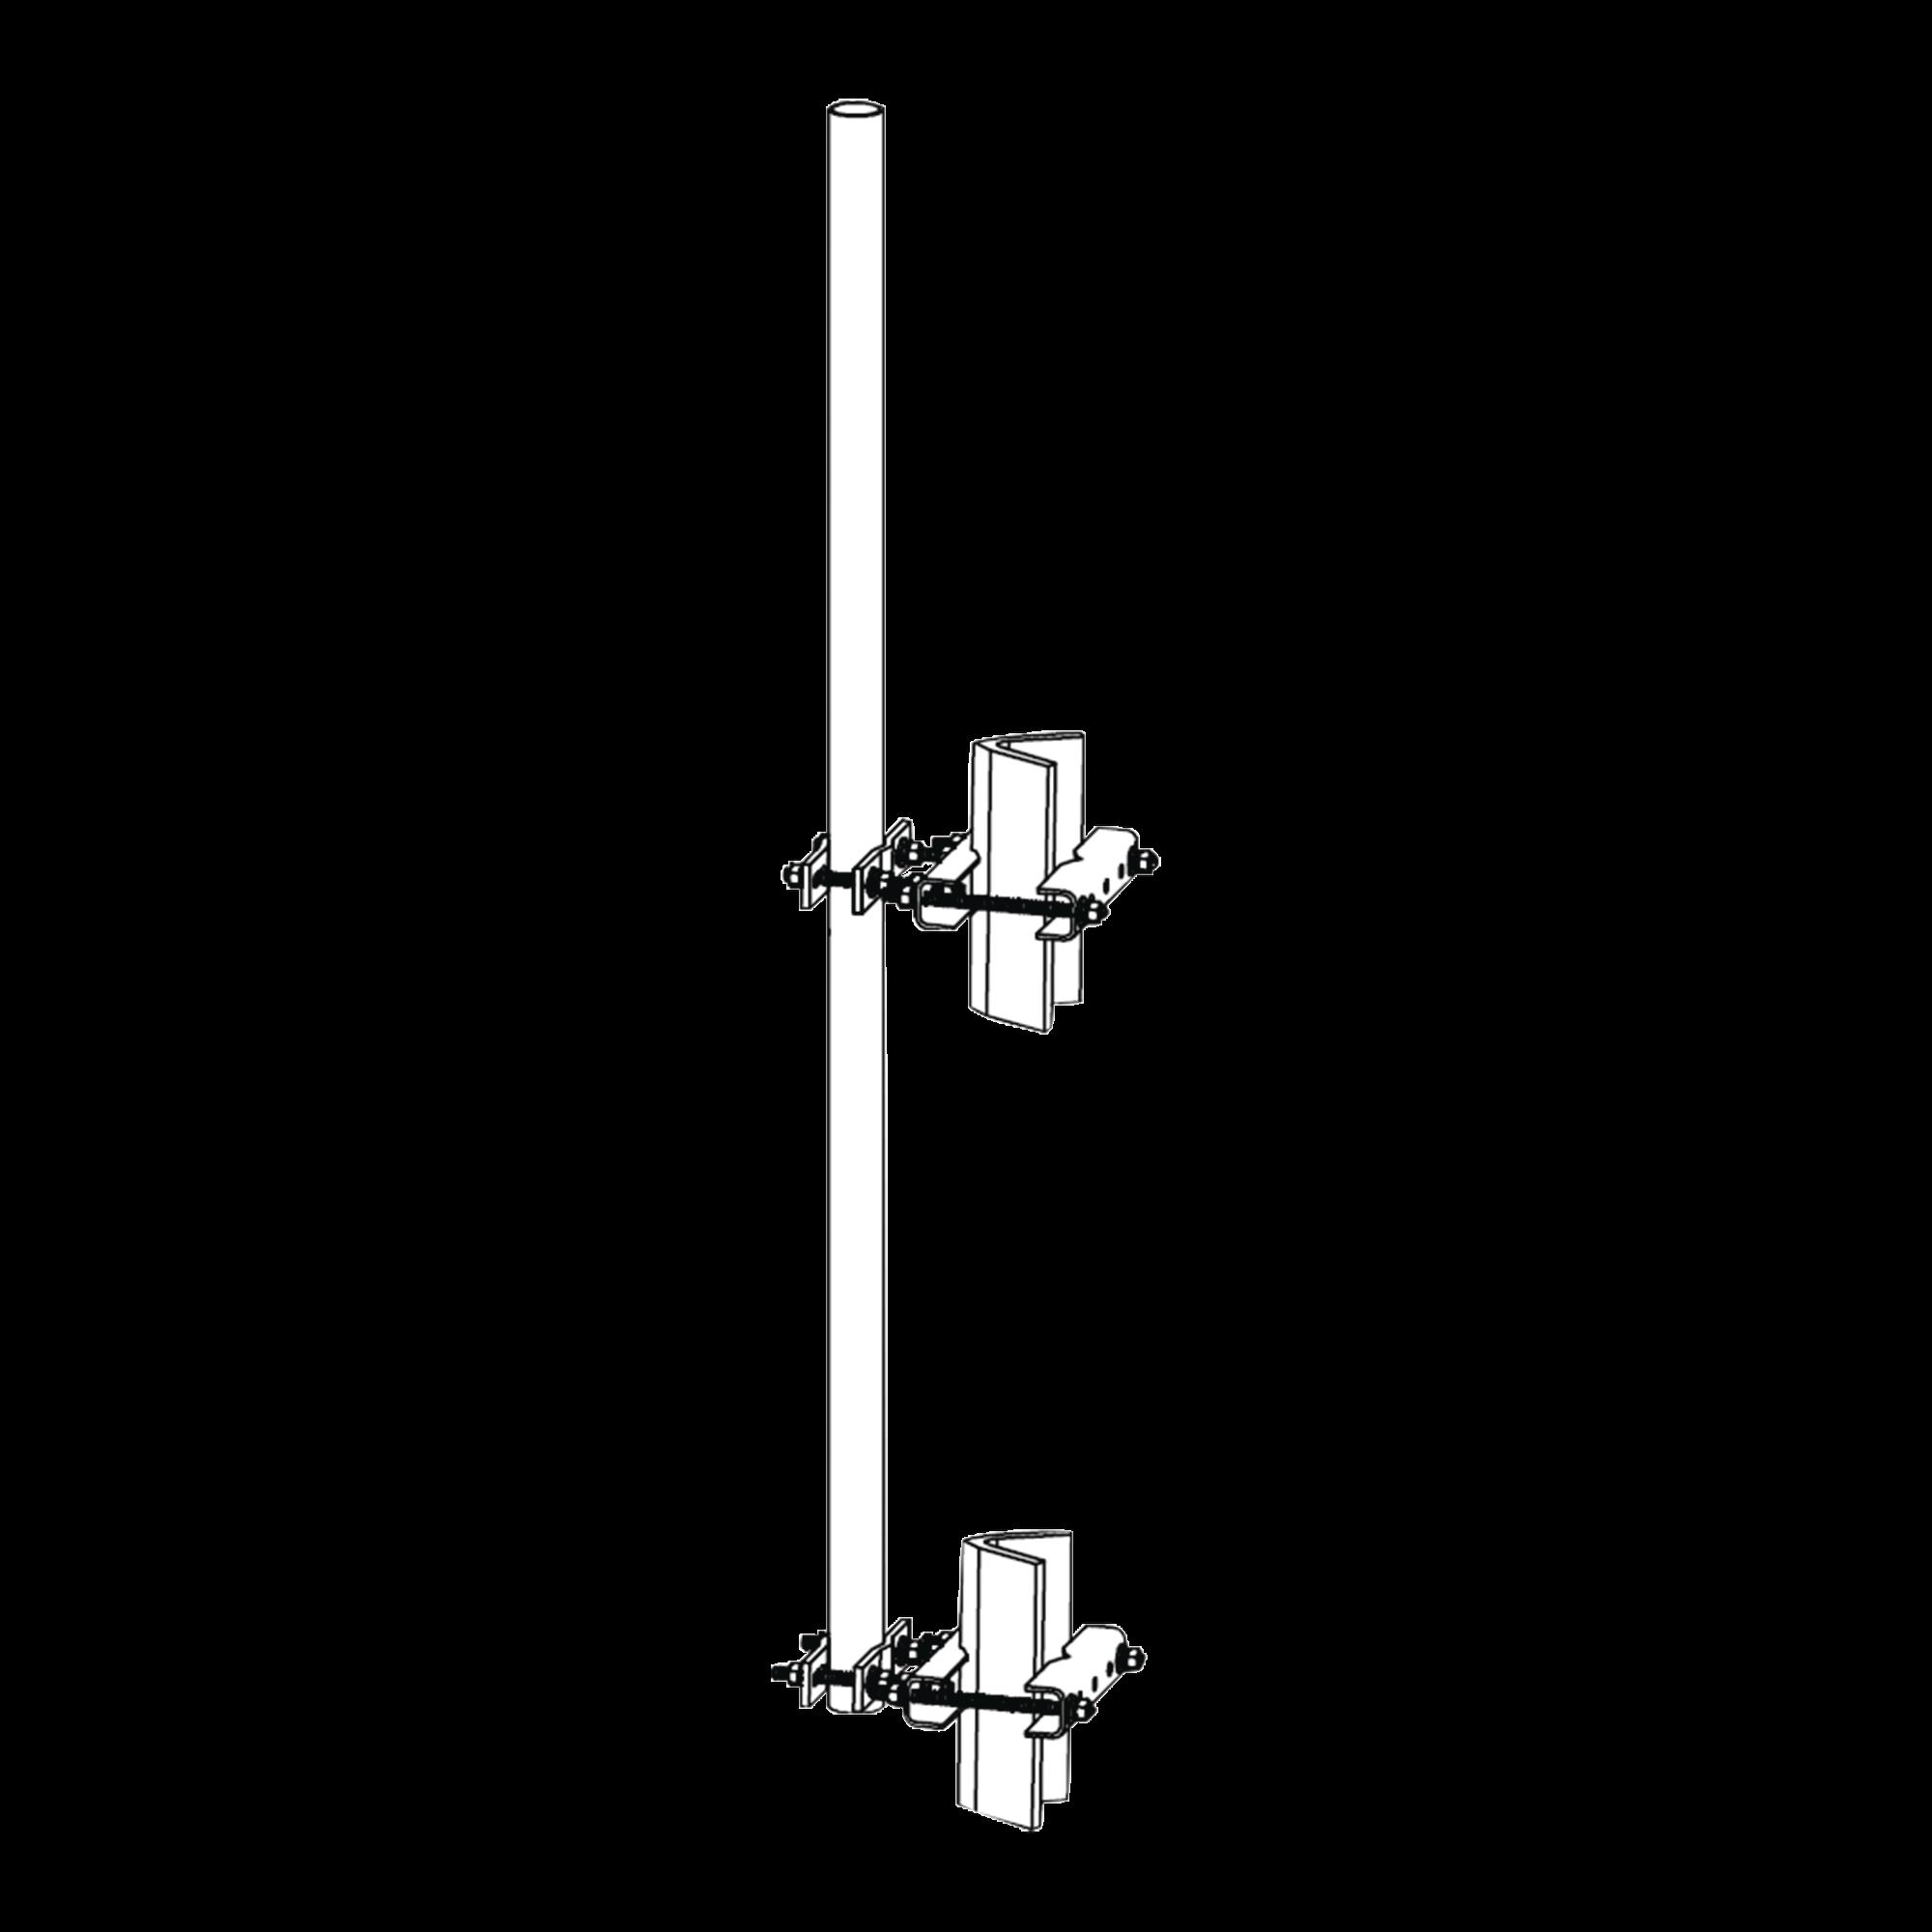 Montaje lateral con Mástil de 1.9 diam. x 6 (1.8m) longitud.